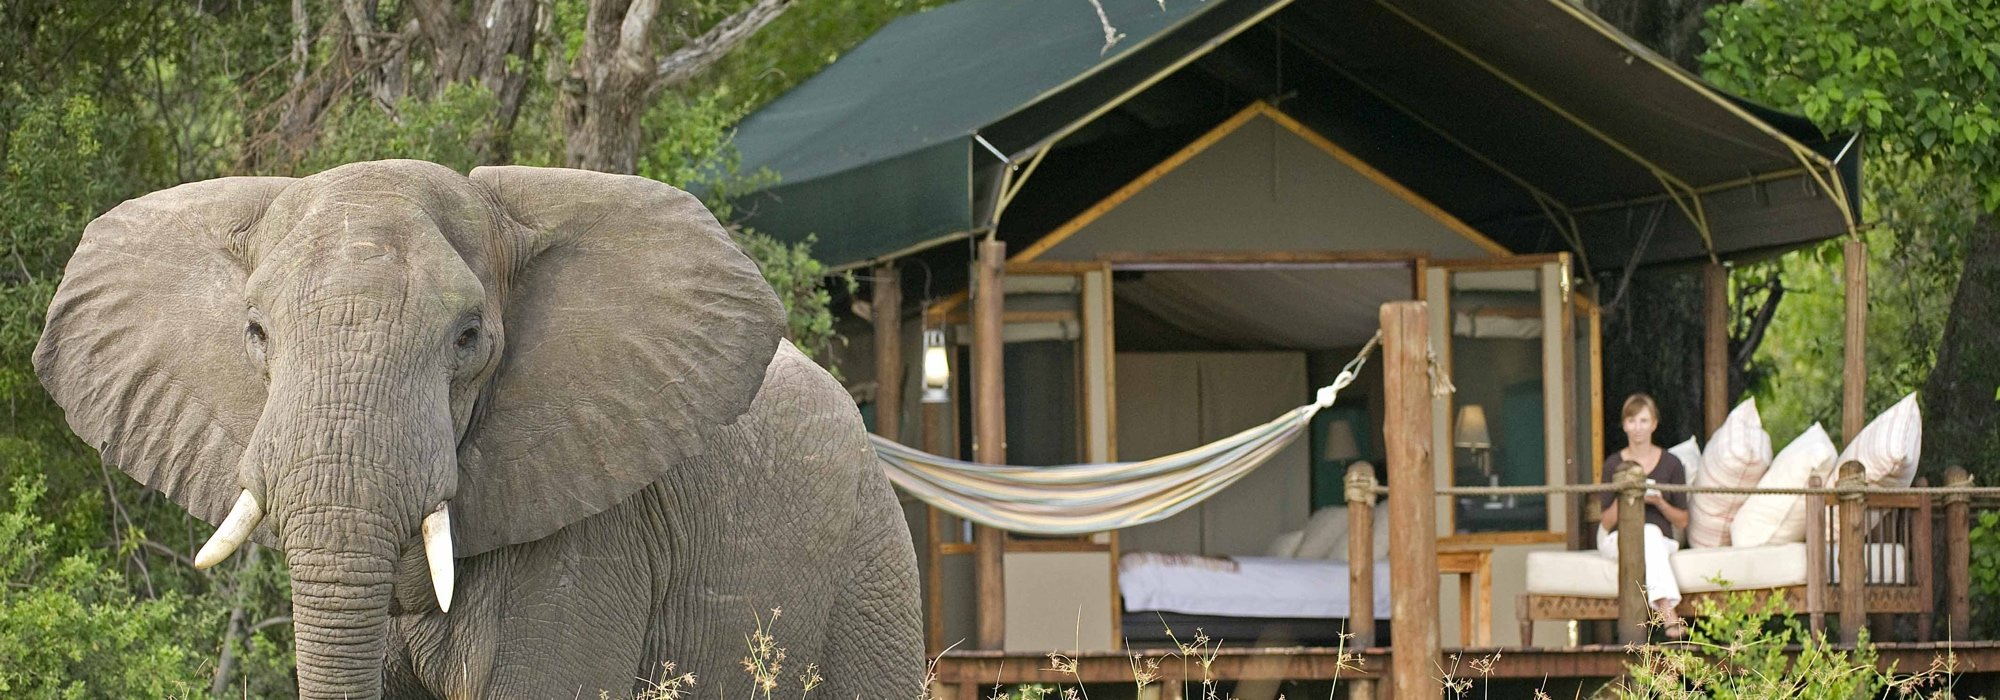 Elephant at Stanley's Camp, Botswana